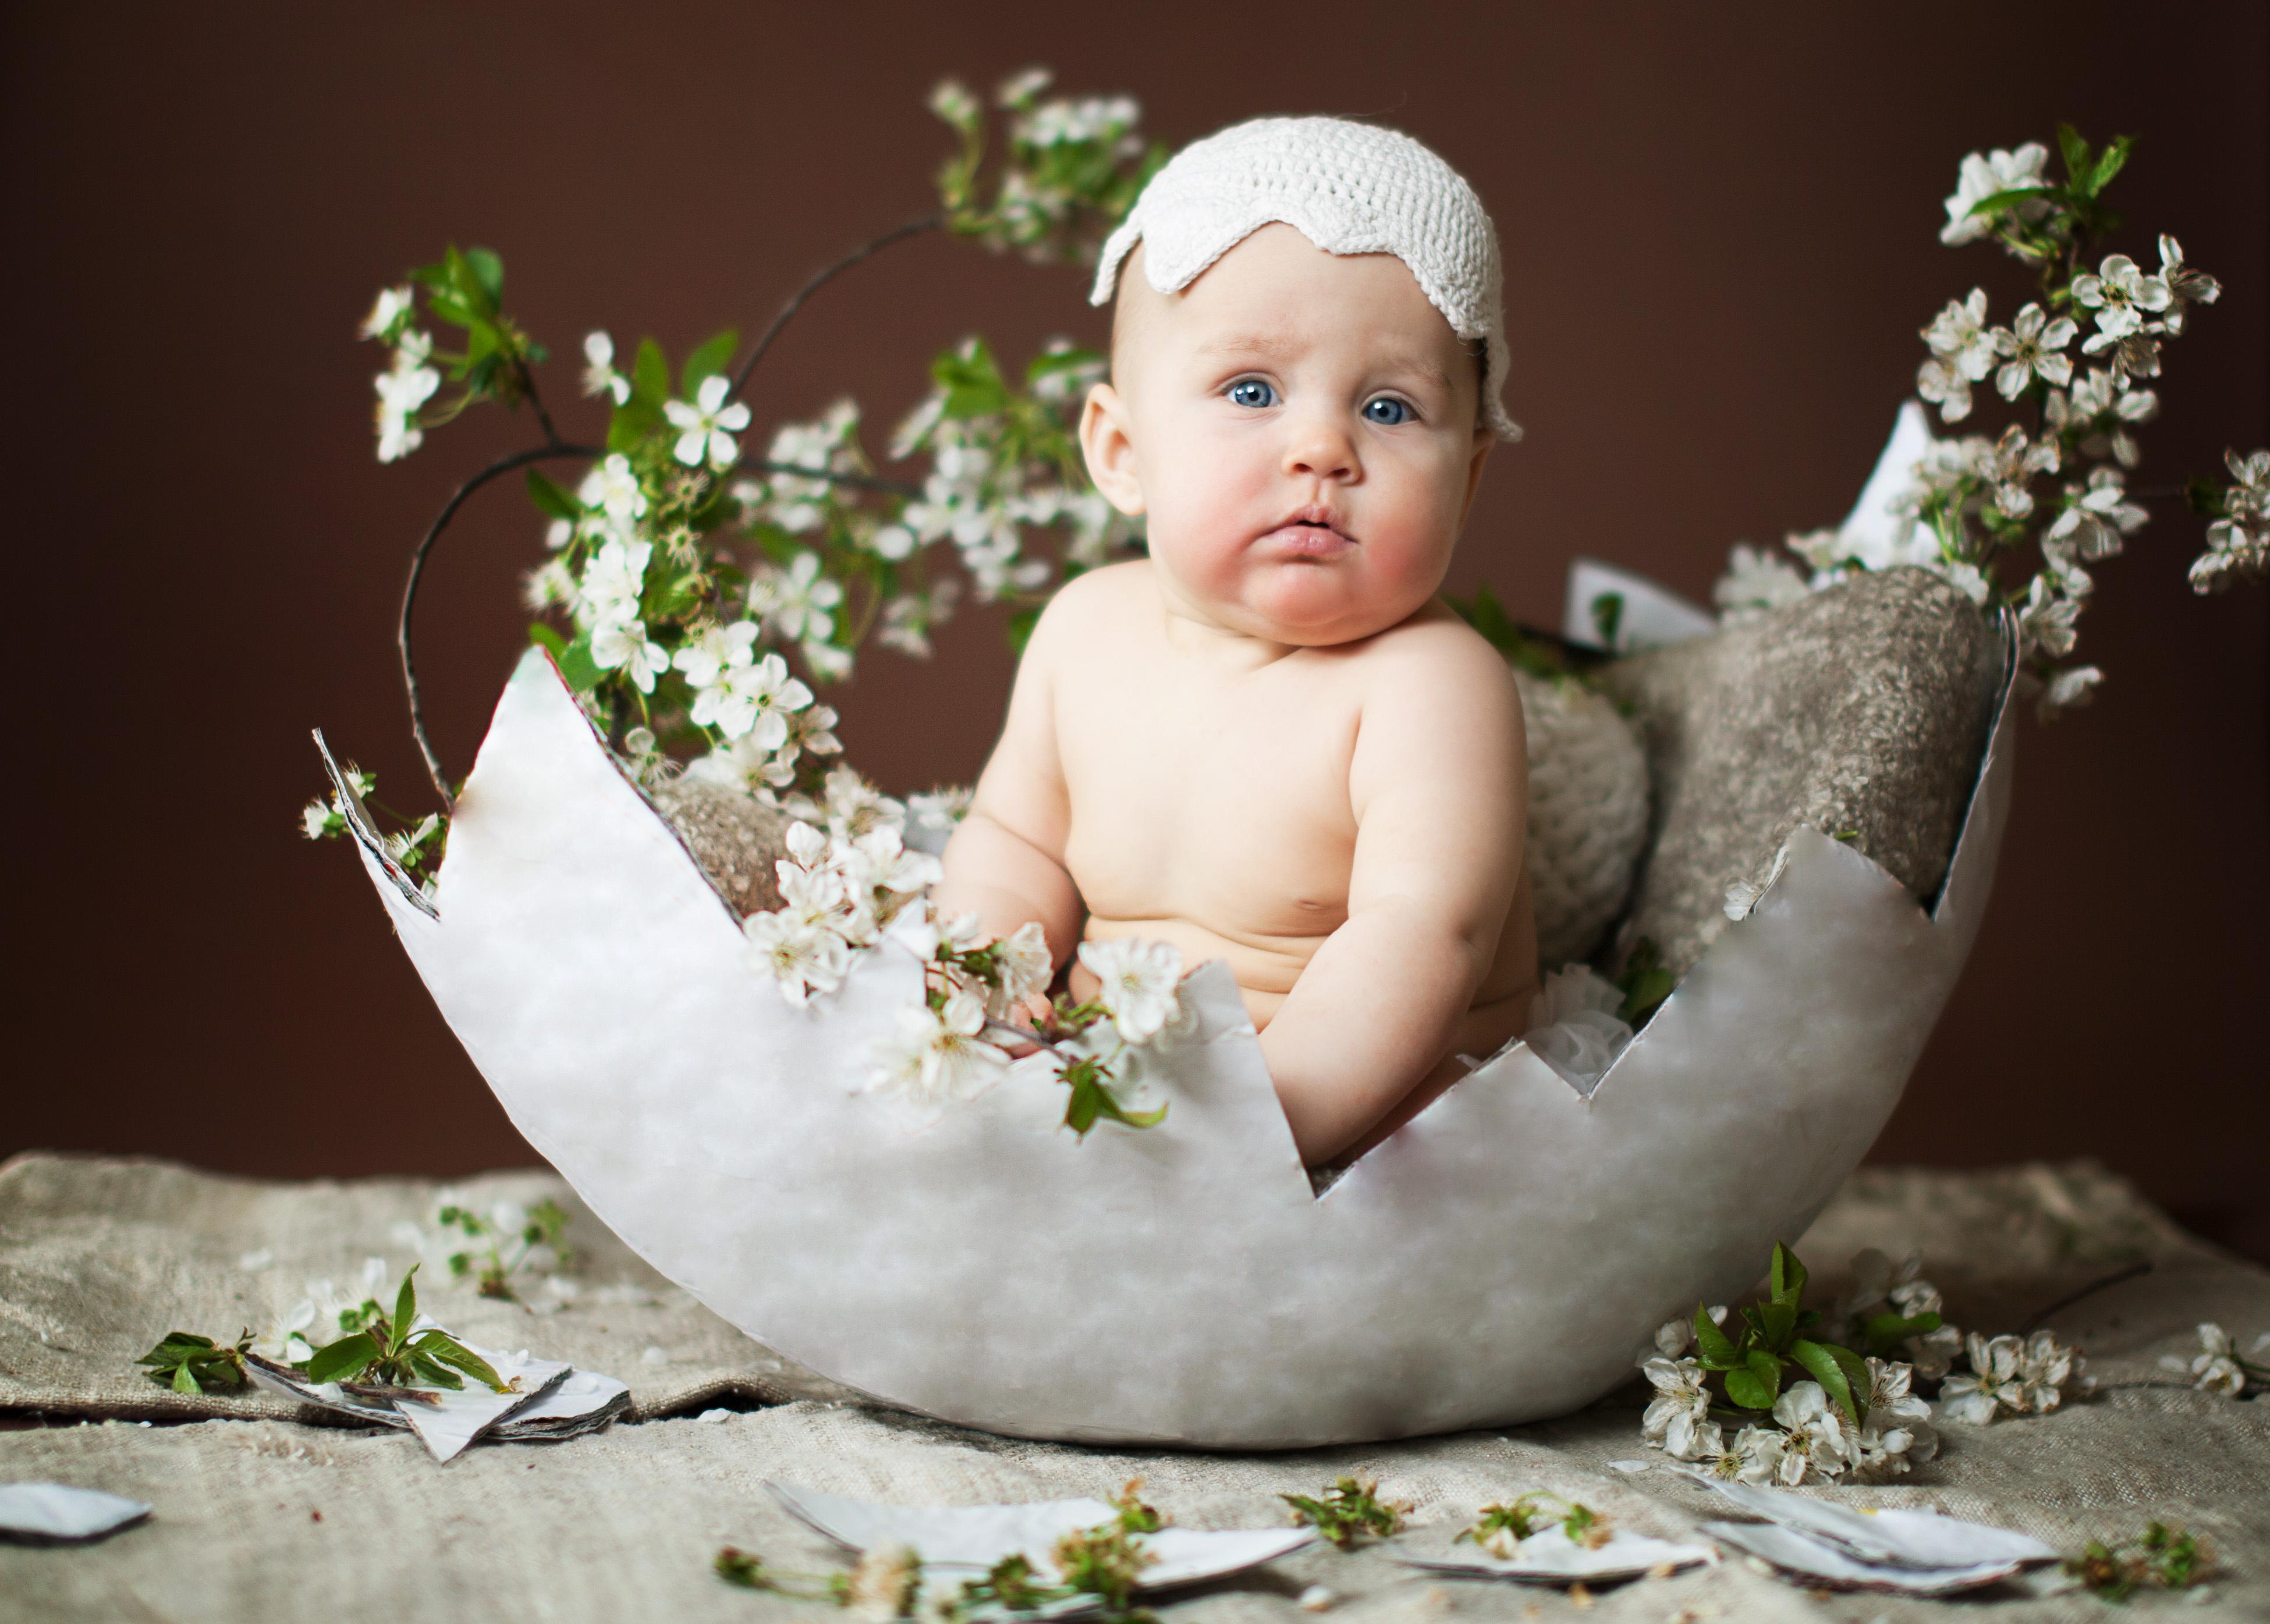 зону плитки картинки весна с малышками большое, корелу вообще